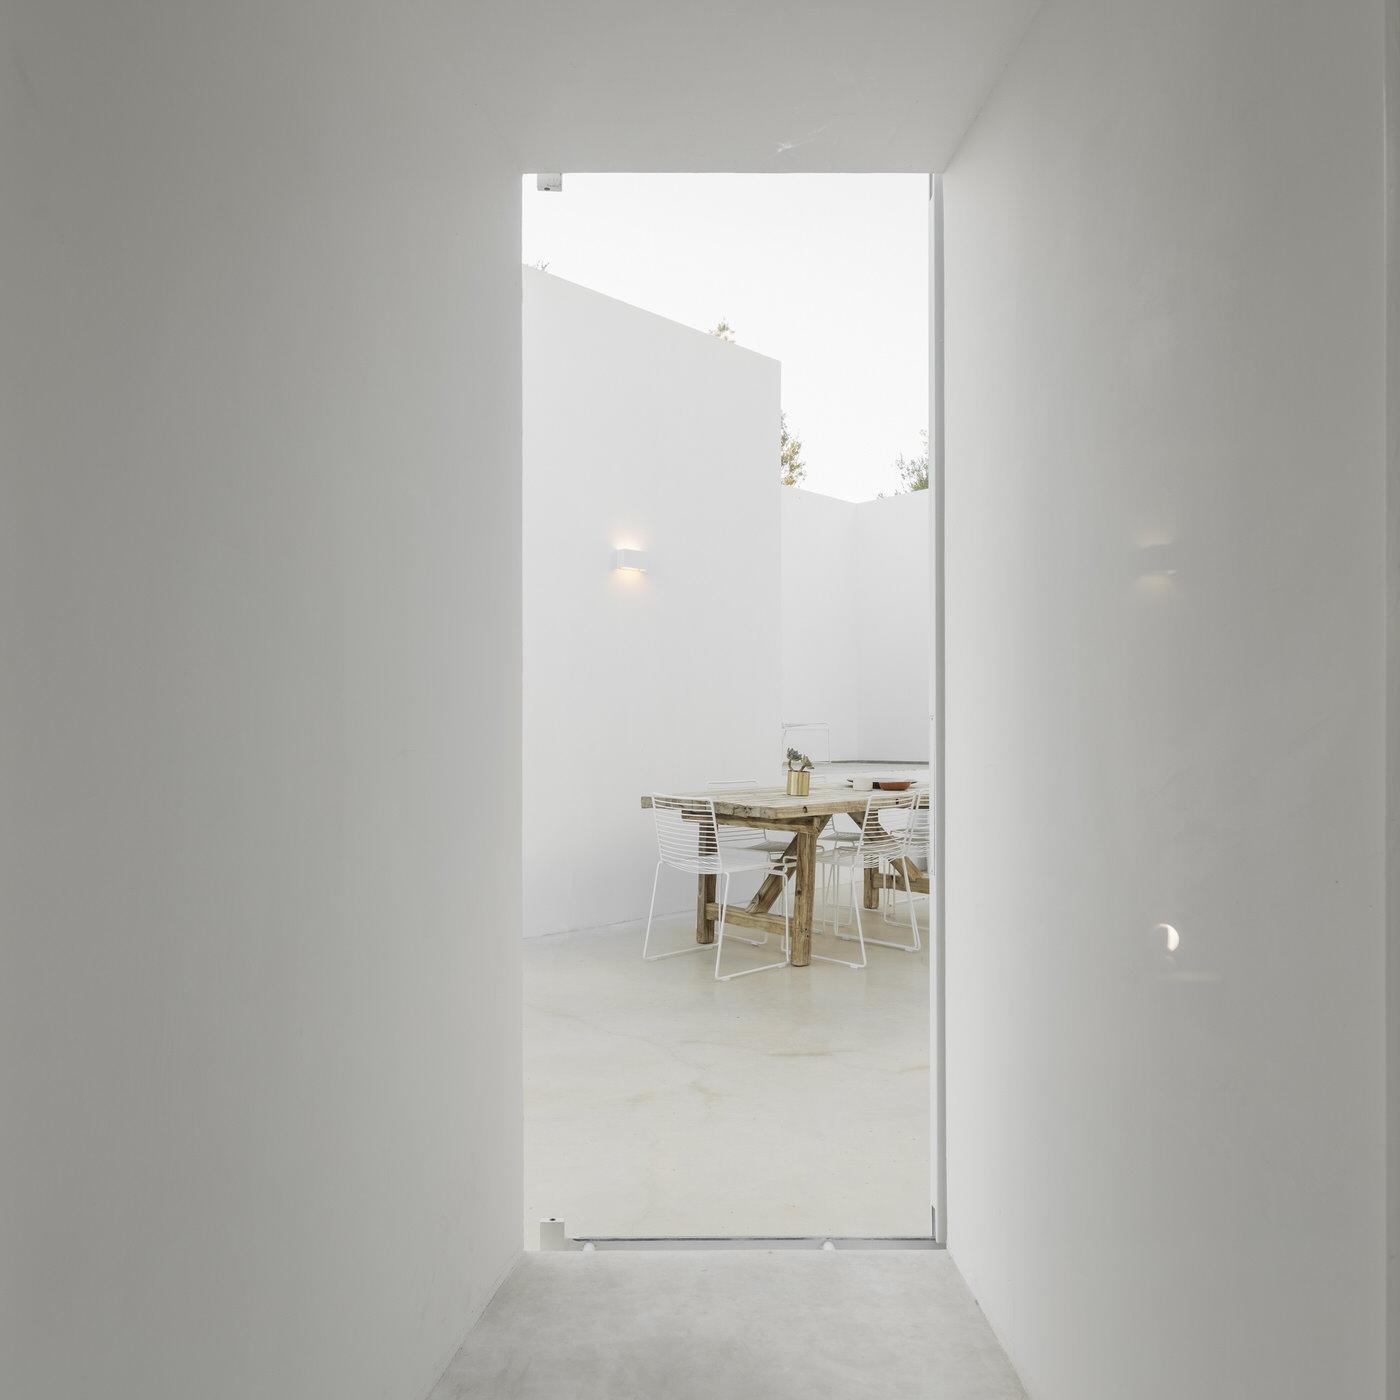 Zalig-Algarve-Casa-Luum-135-1_1